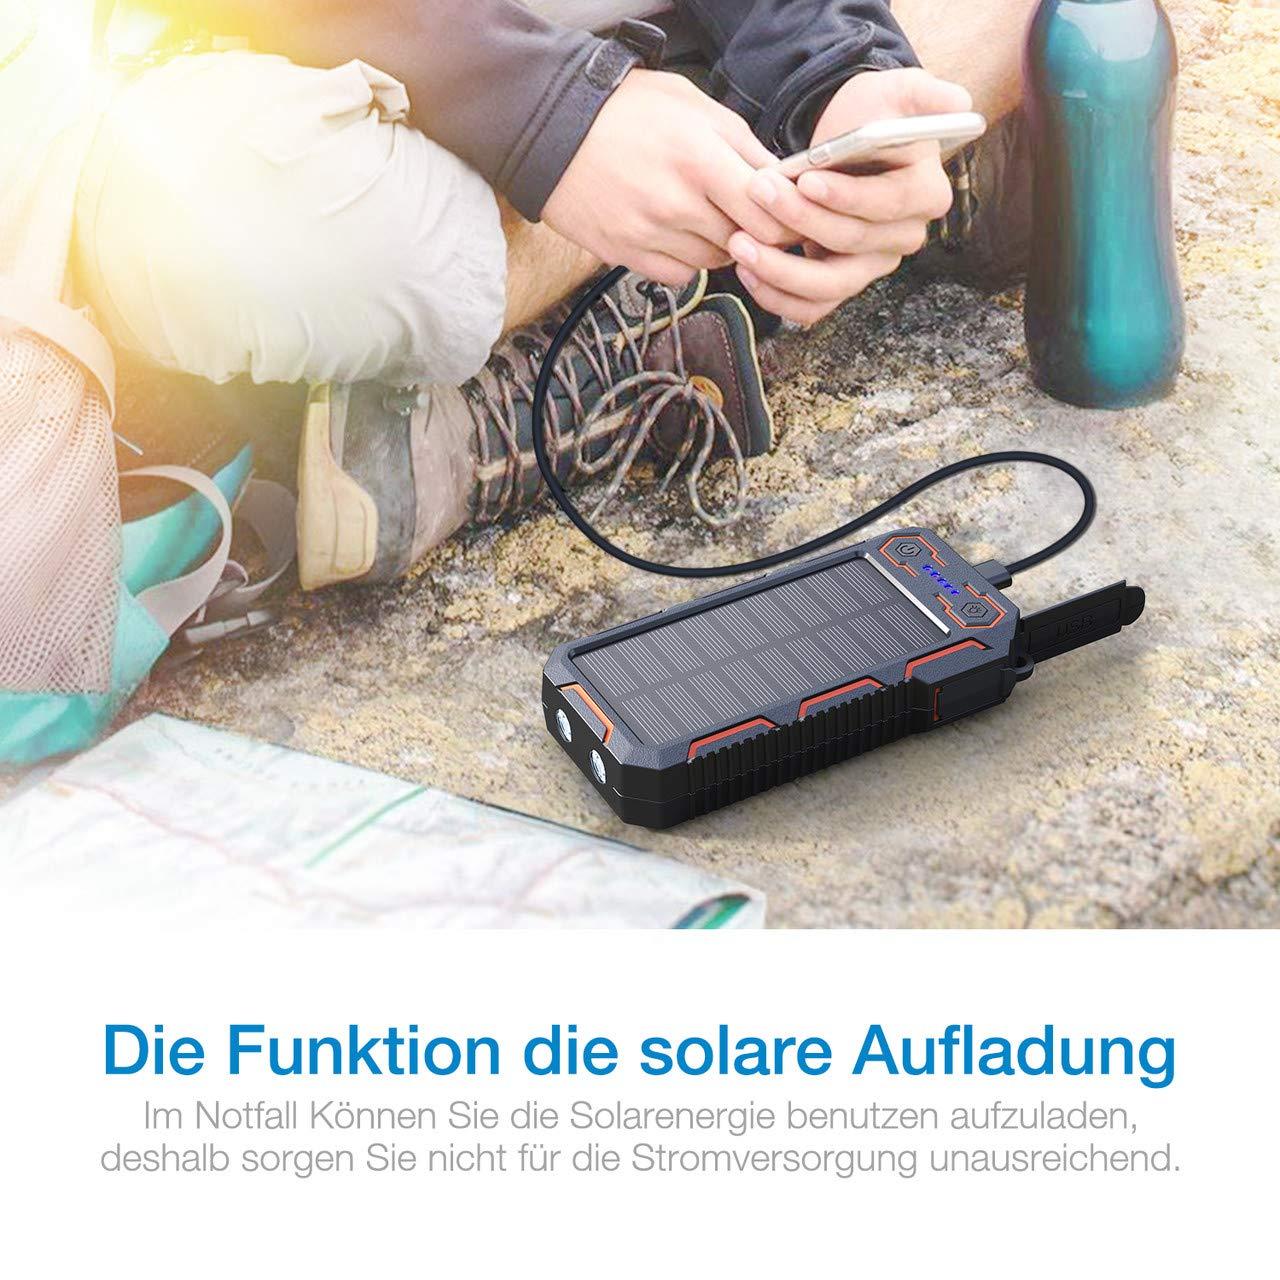 POWERADD Apollo 268000mAh Dual USB Tragbare Solar Ladegerät, Power Bank für iPhone und Handy